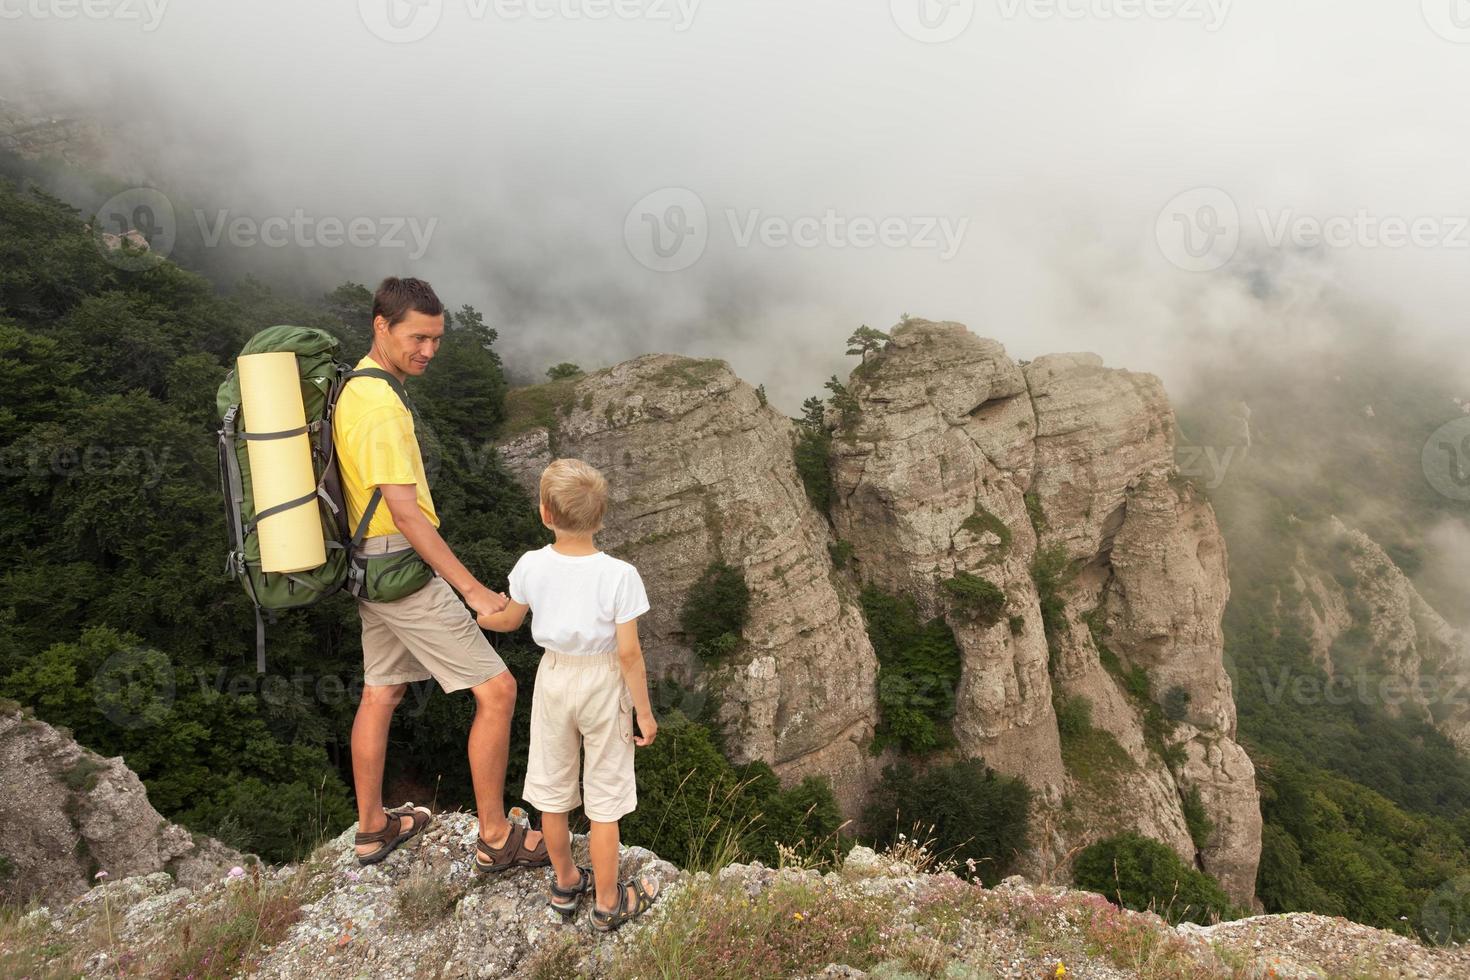 backpacker met zoontje in de mistige bergen. foto